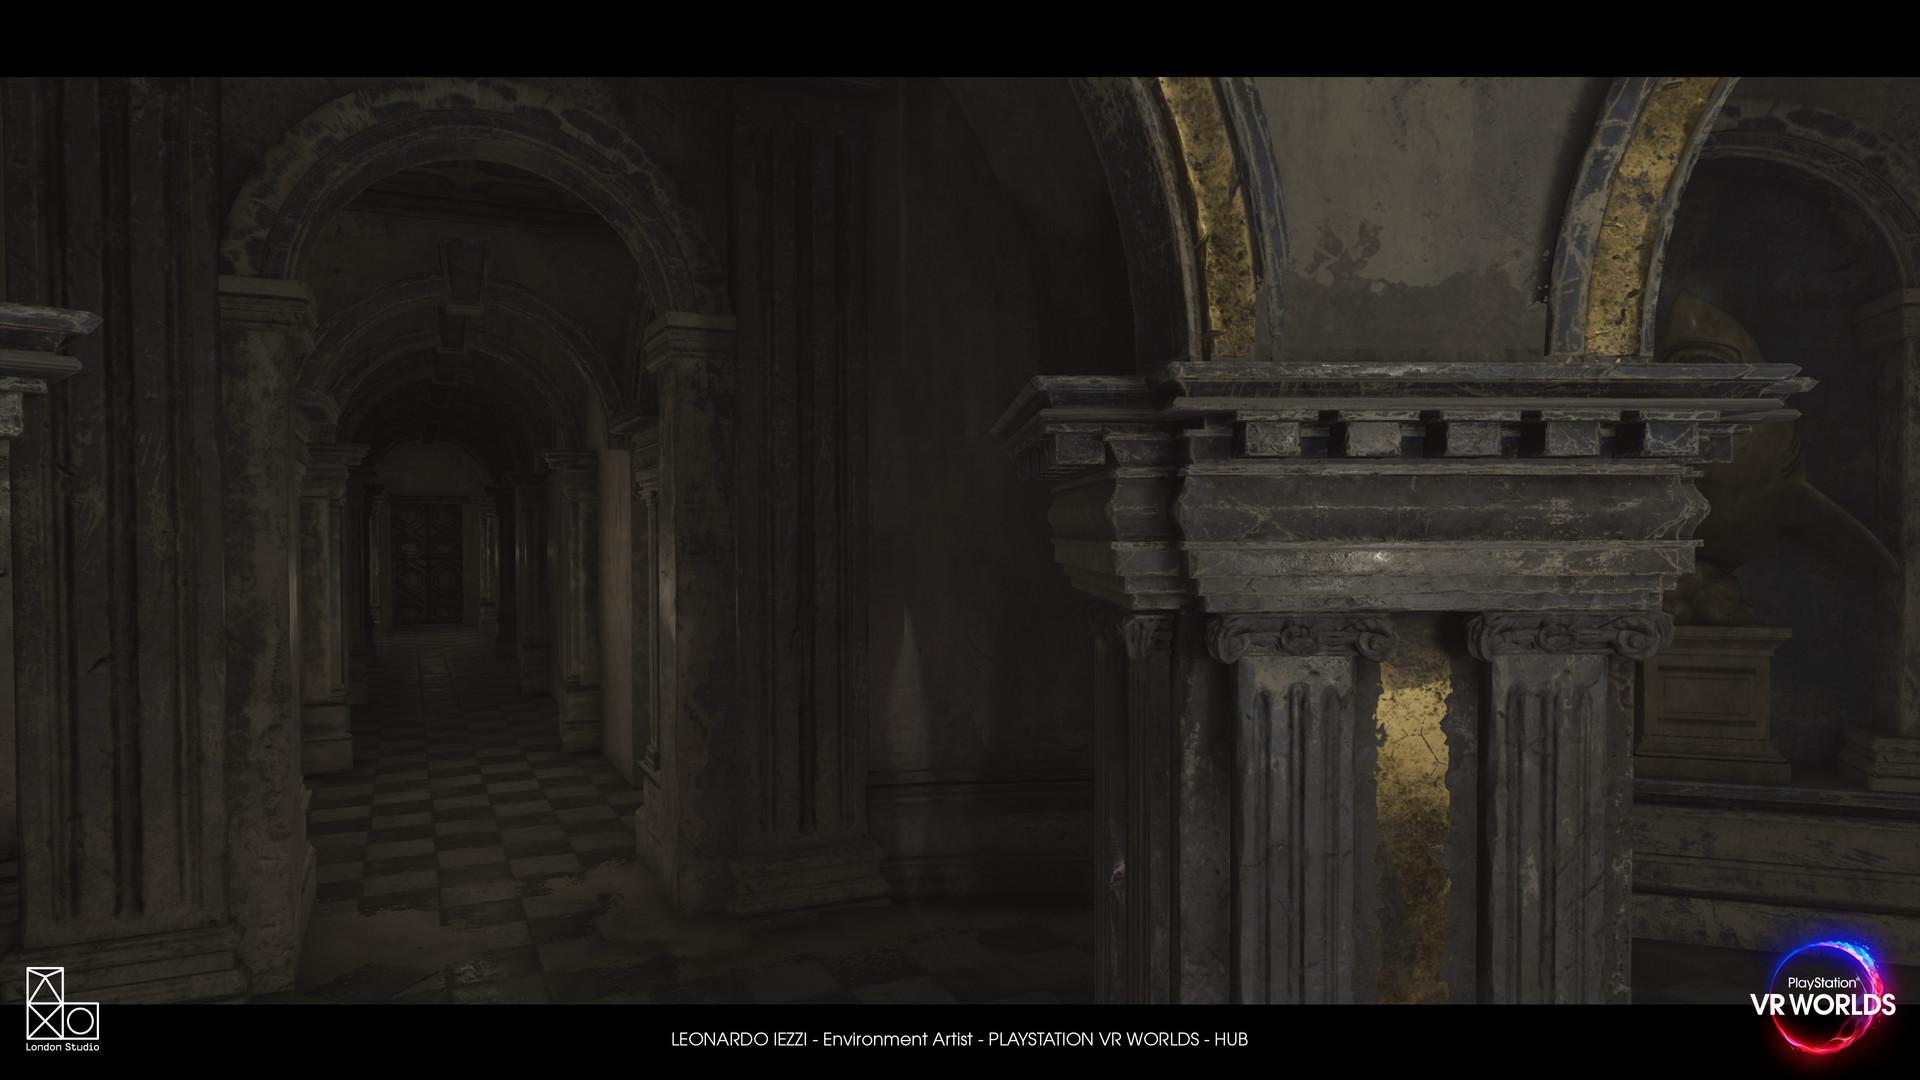 Leonardo iezzi leonardo iezzi environment artist vr worlds hub 05